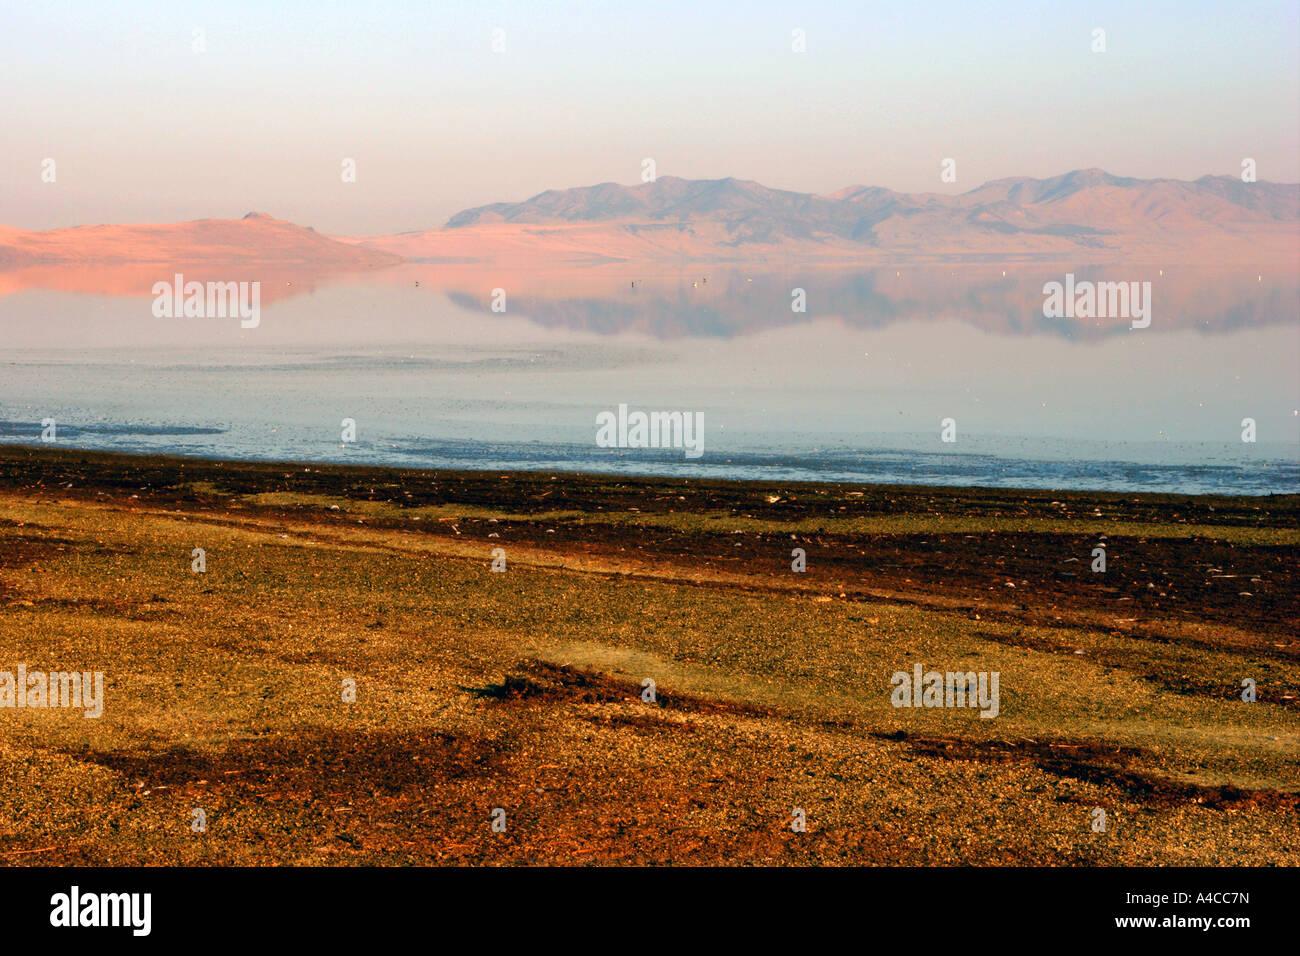 Sunrise Great Salt Lake City, utah Stockfoto